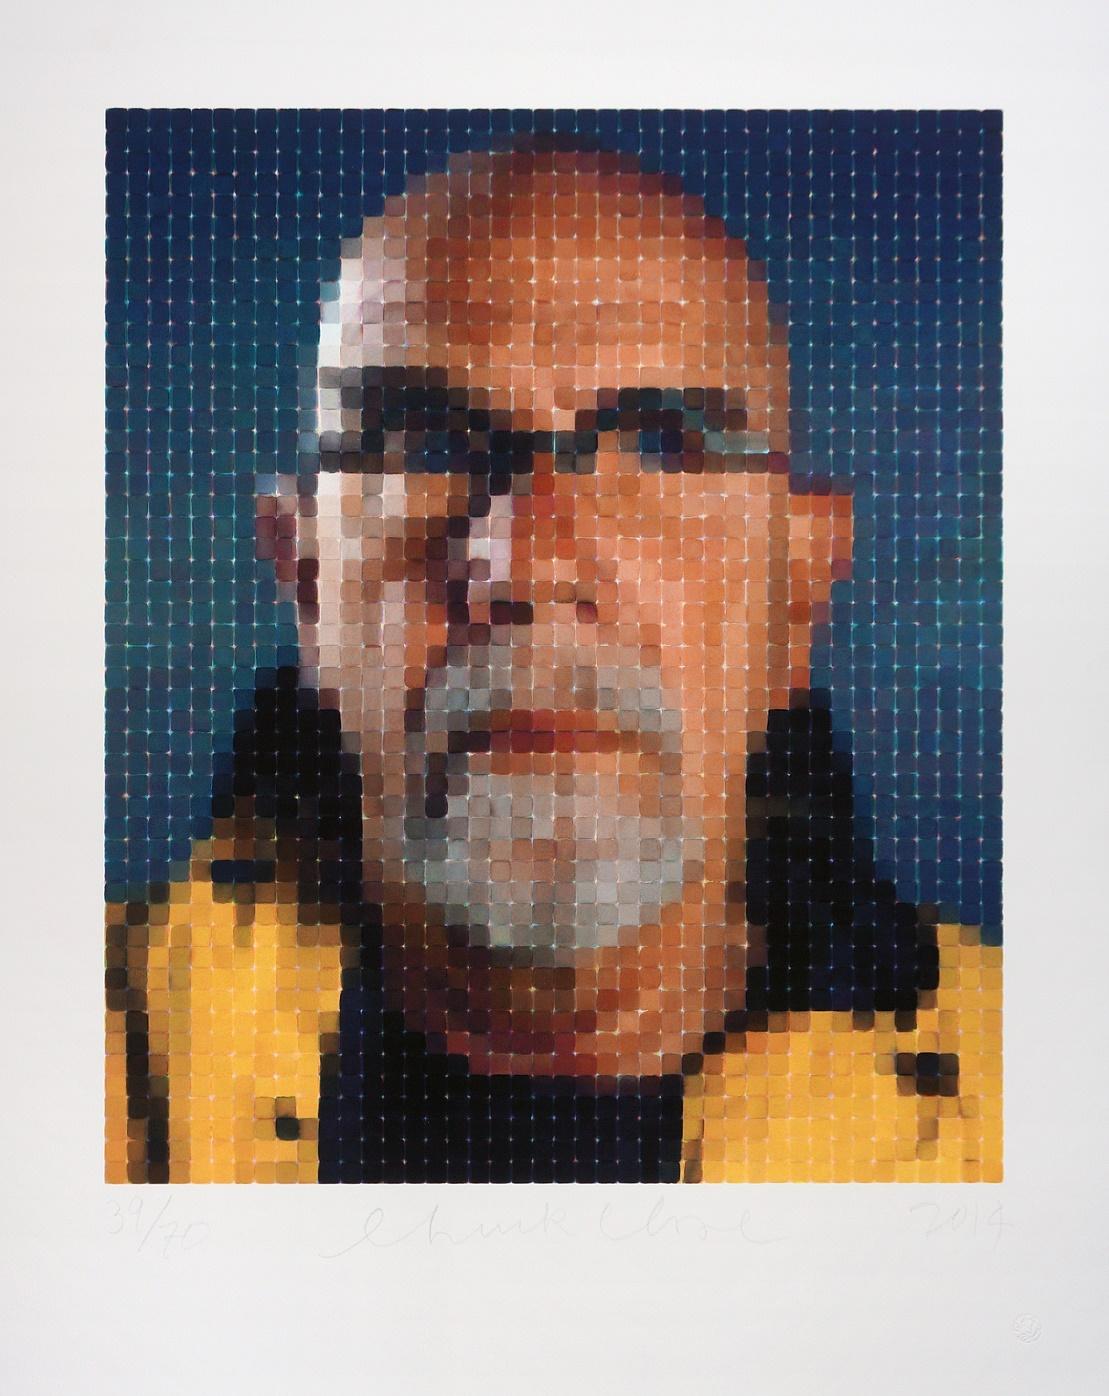 Self-Portrait (Yellow Raincoat), 2013